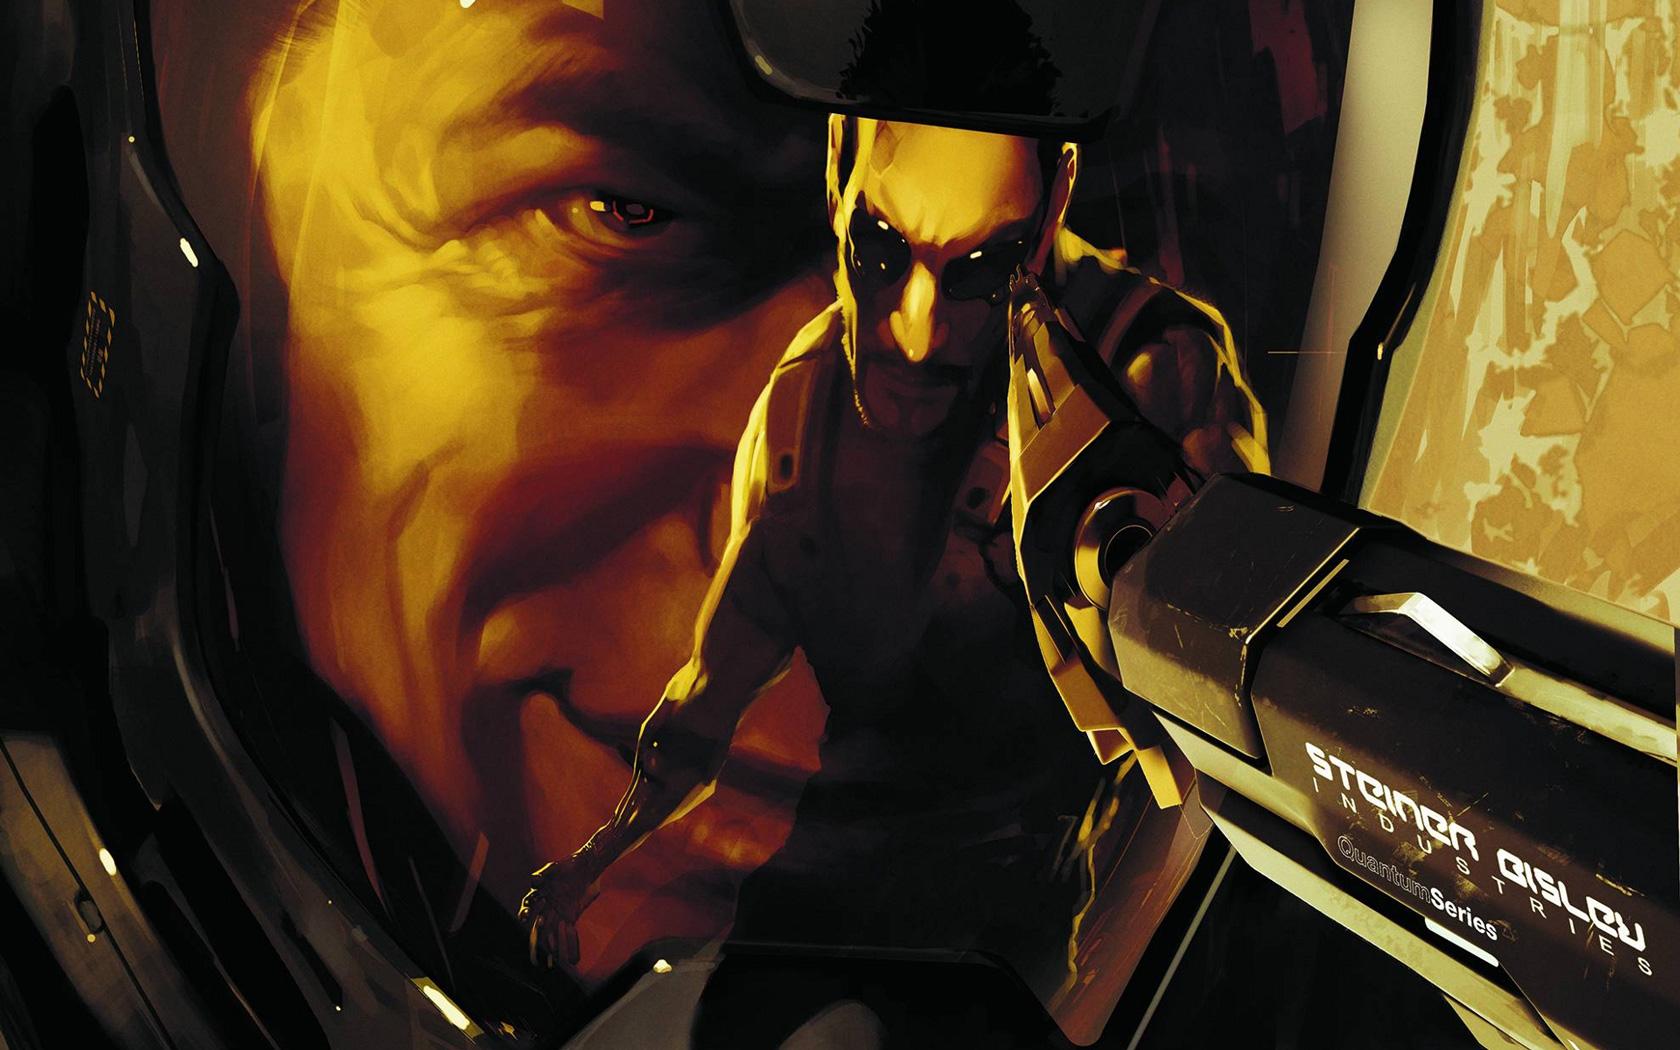 Free Deus Ex: Human Revolution Wallpaper in 1680x1050